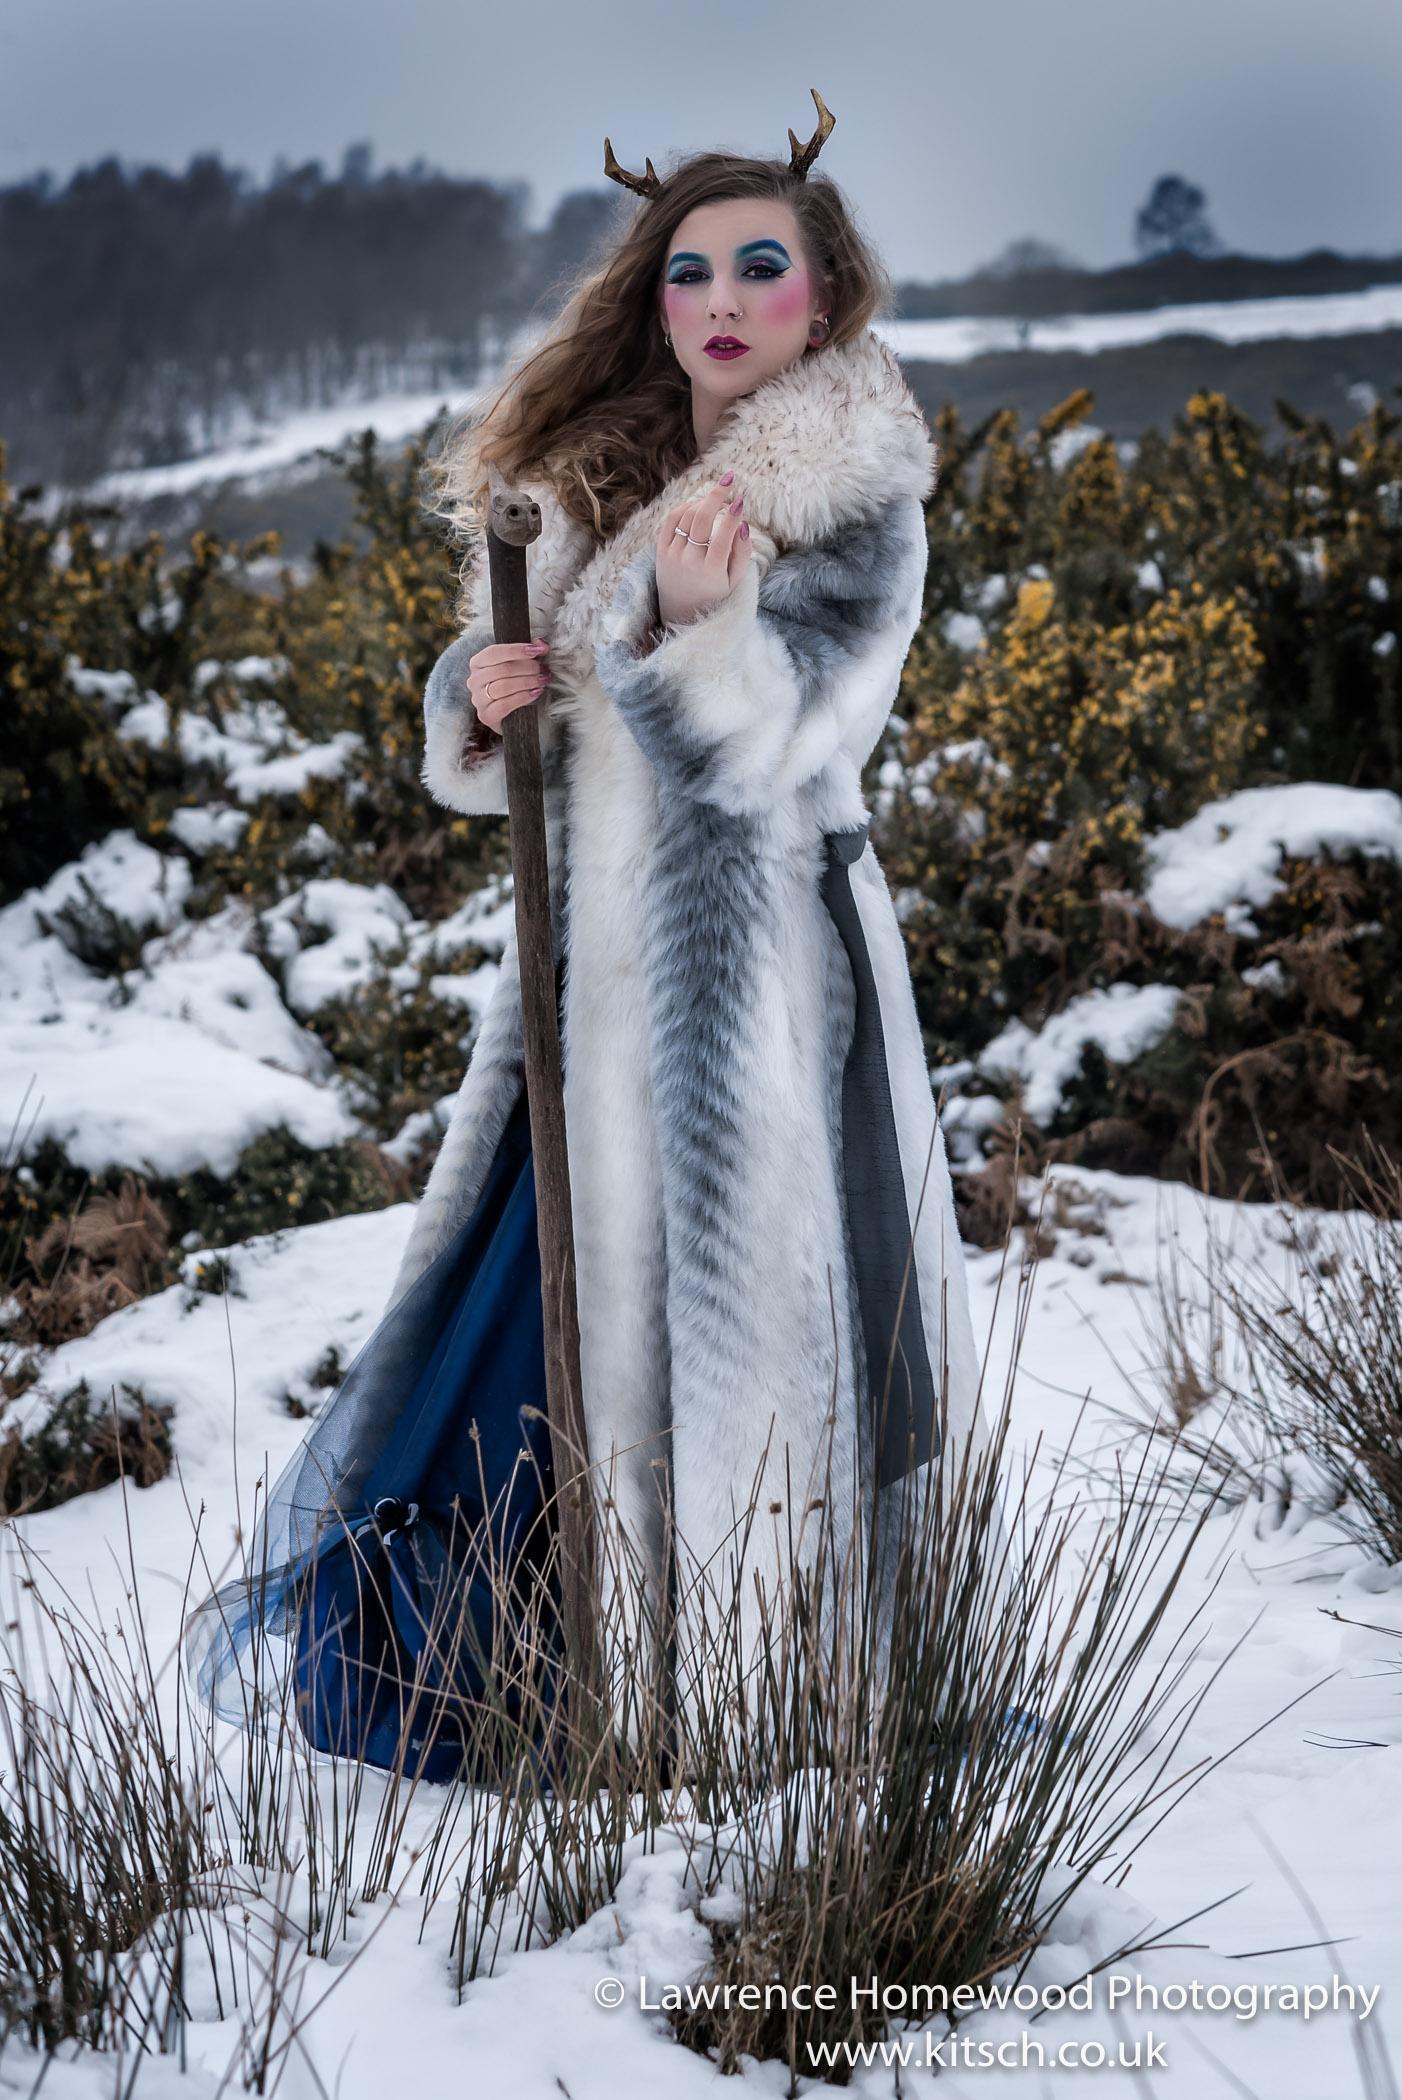 Fawn Princess - A Winters Tale03